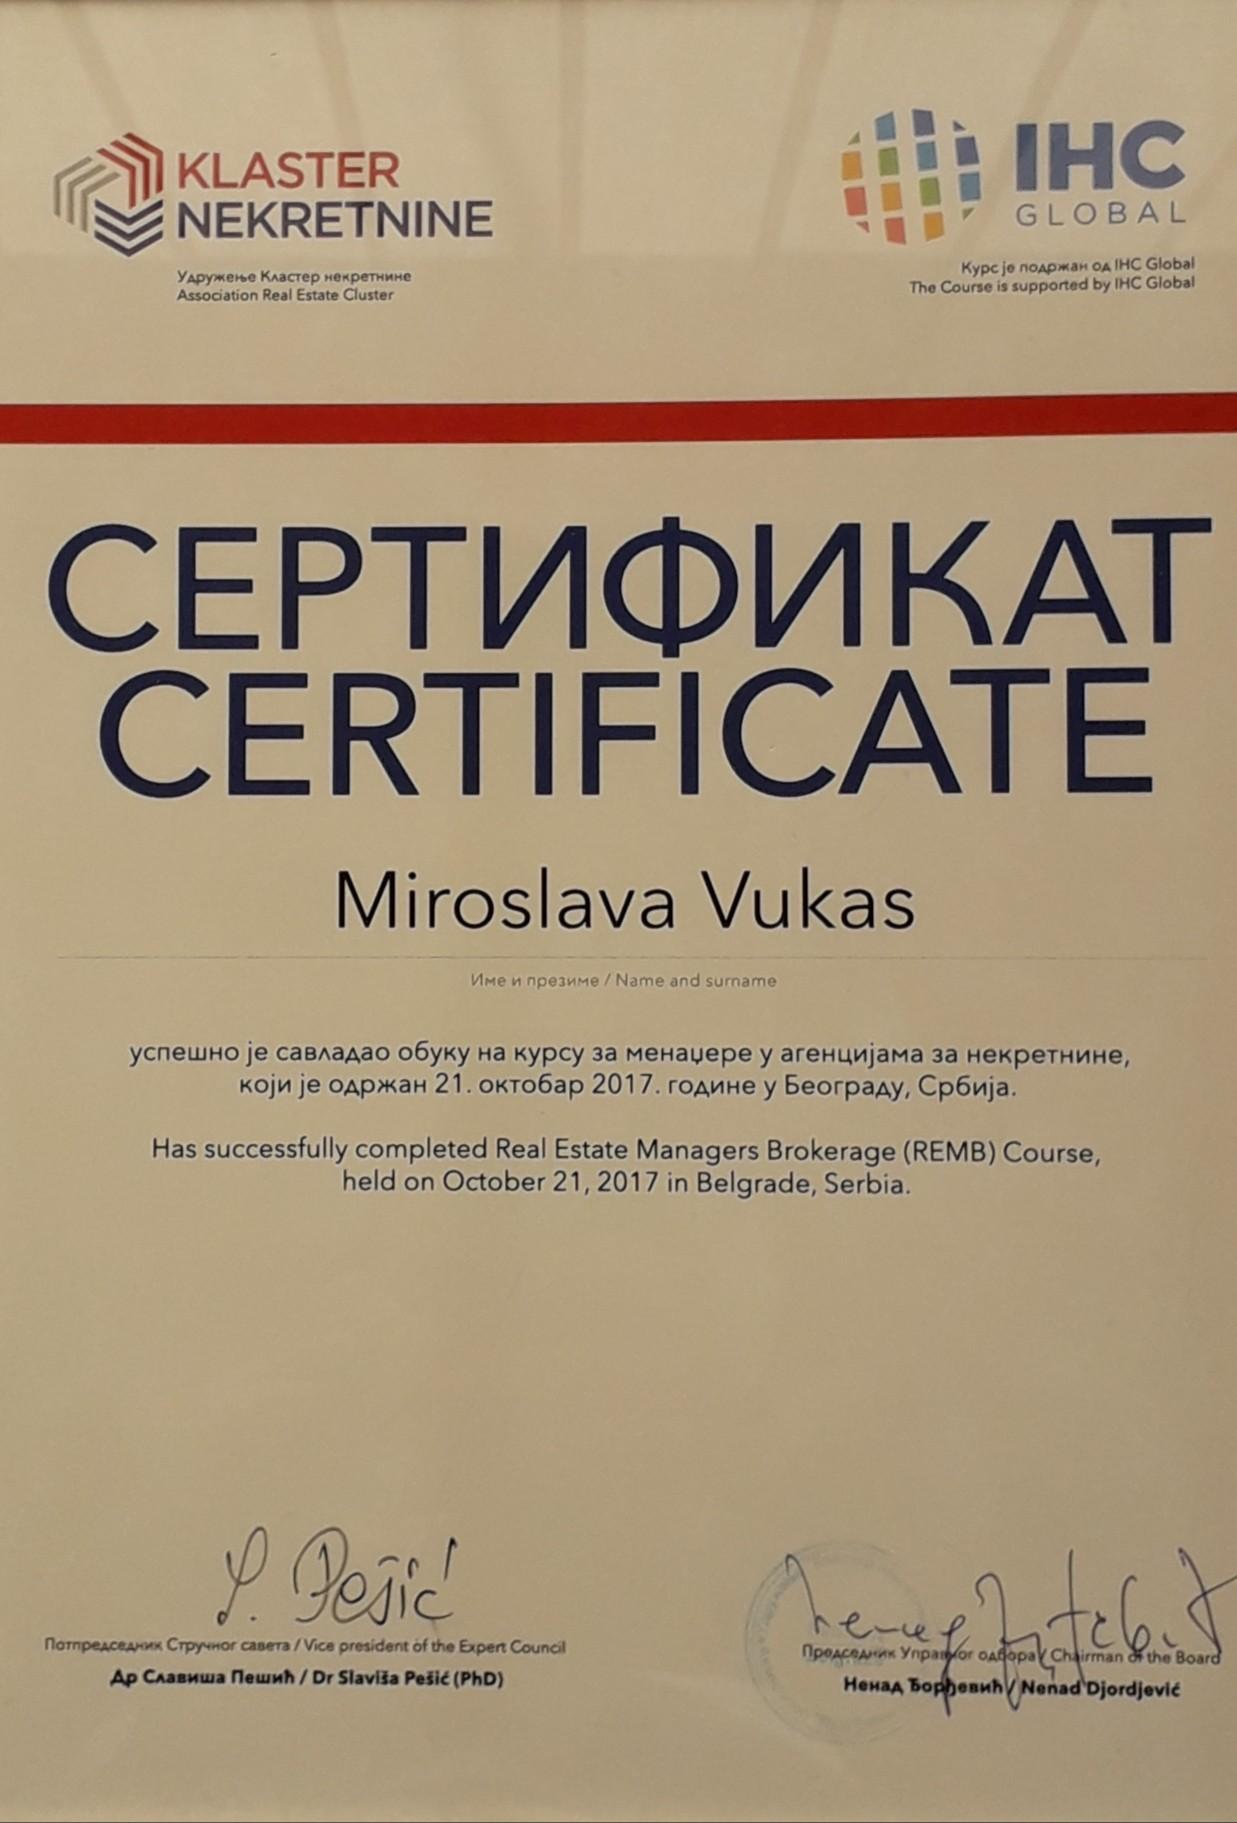 IHC Global sertifikat